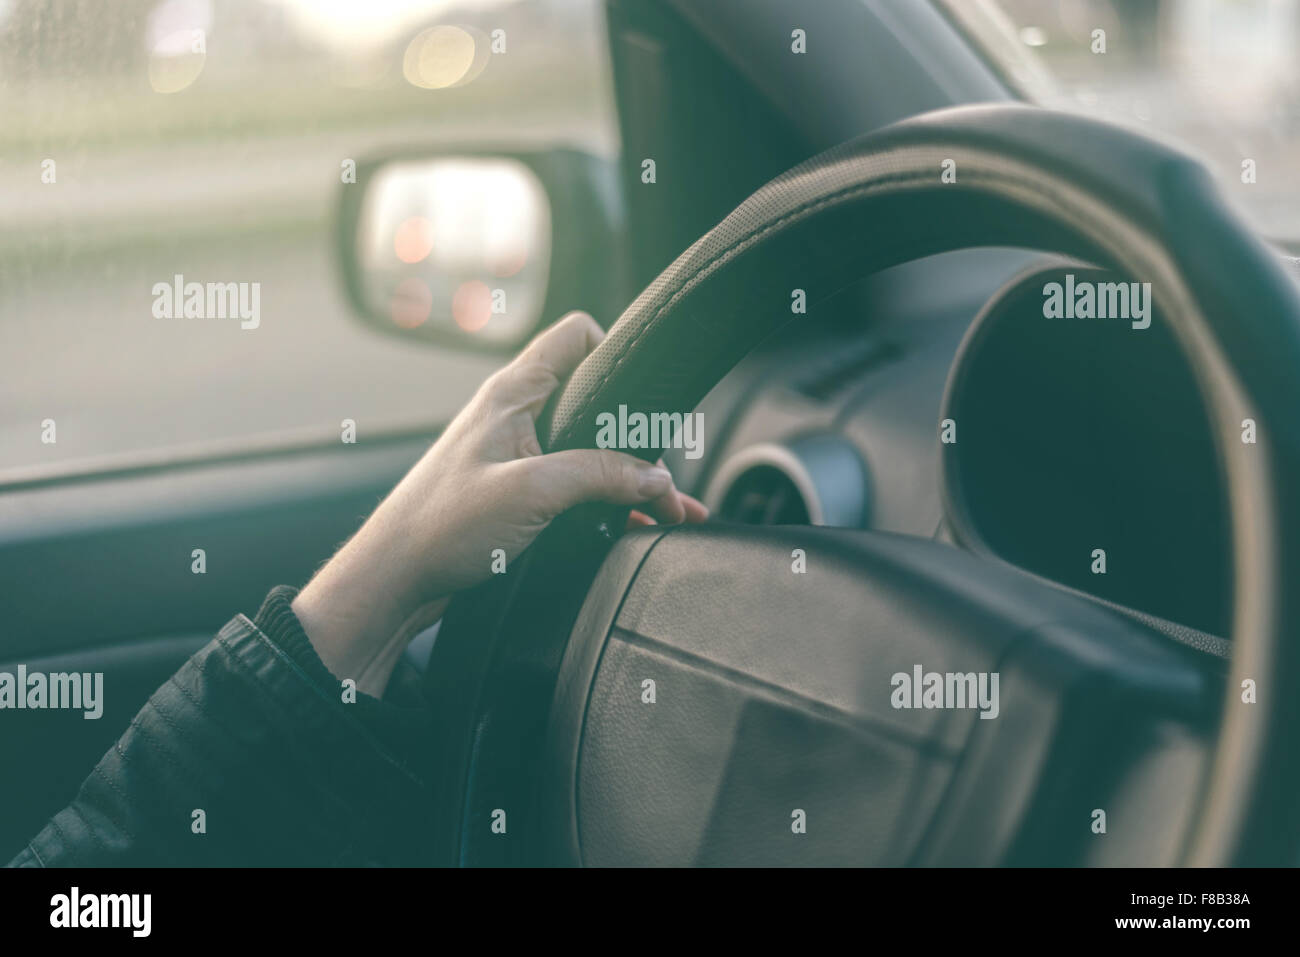 2932x2932 Pubg Android Game 4k Ipad Pro Retina Display Hd: Steering Wheel Woman Stock Photos & Steering Wheel Woman